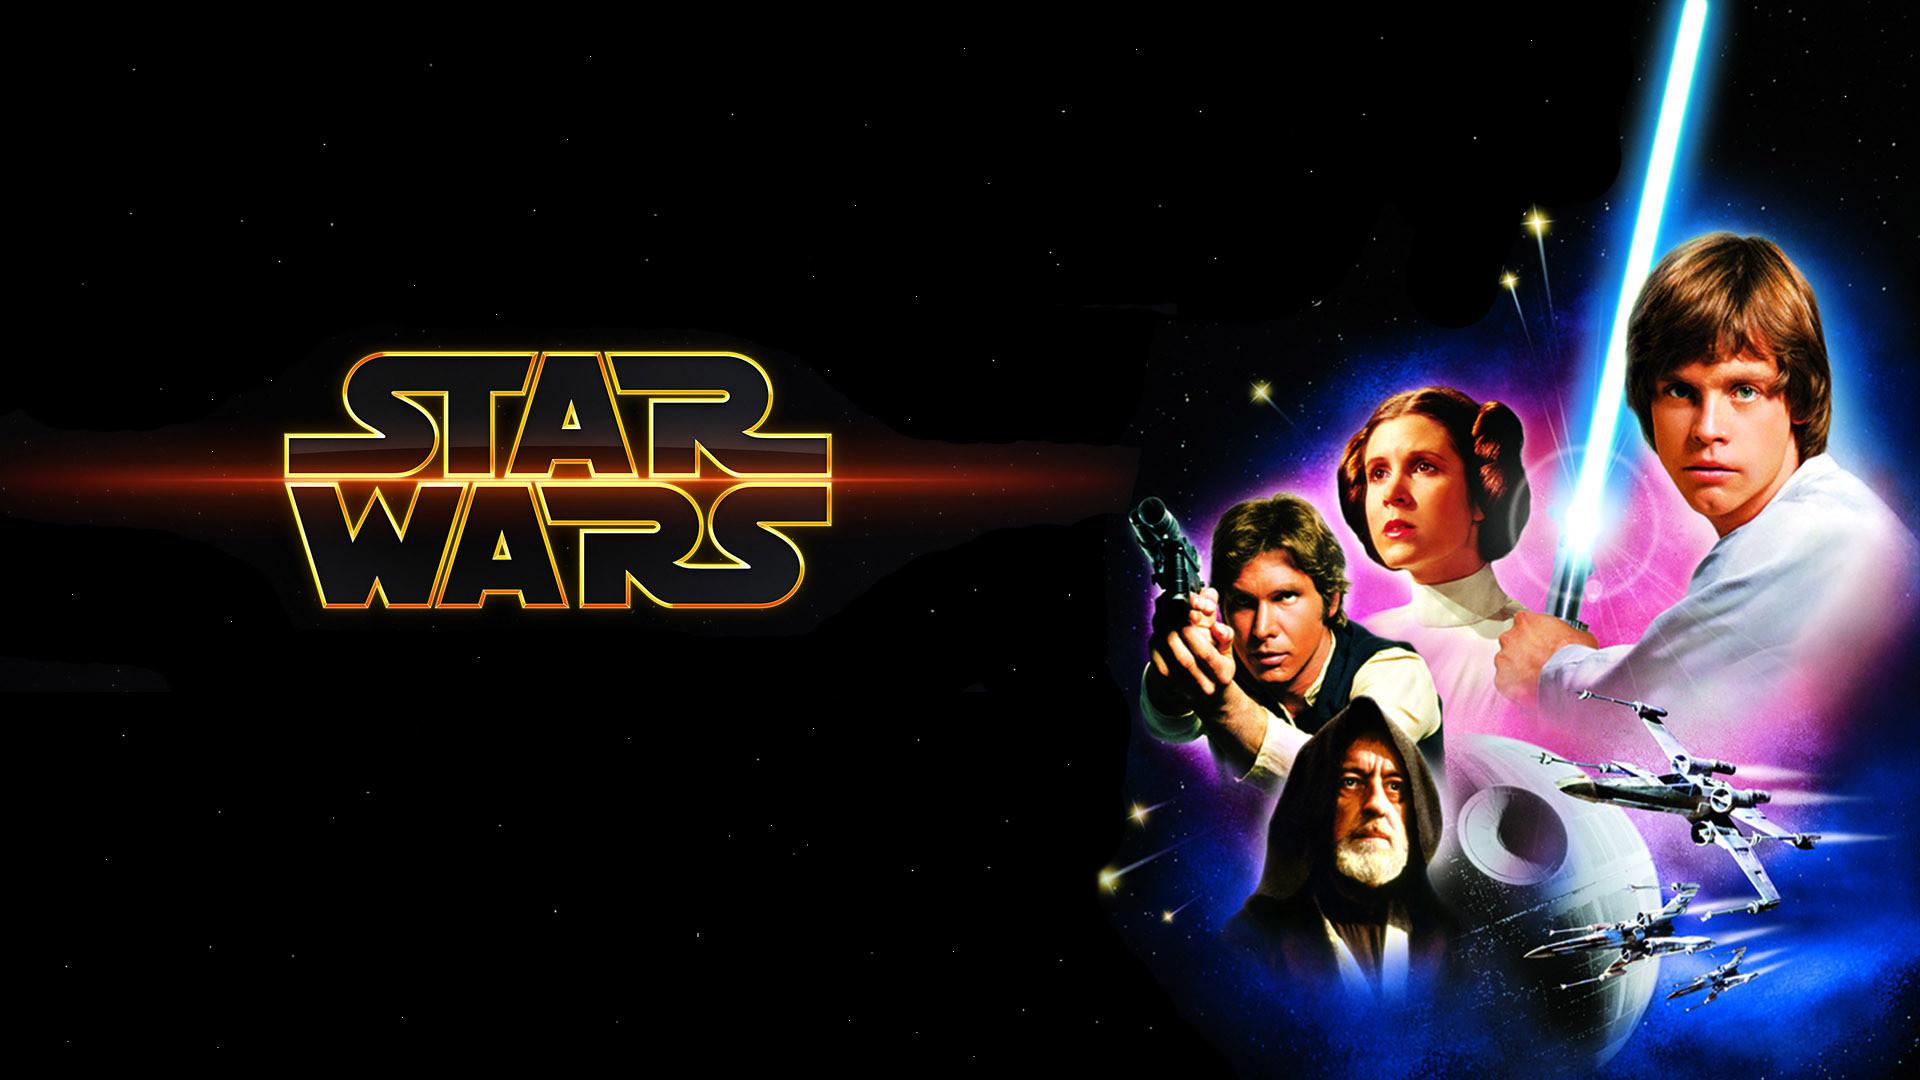 download star wars episode 4